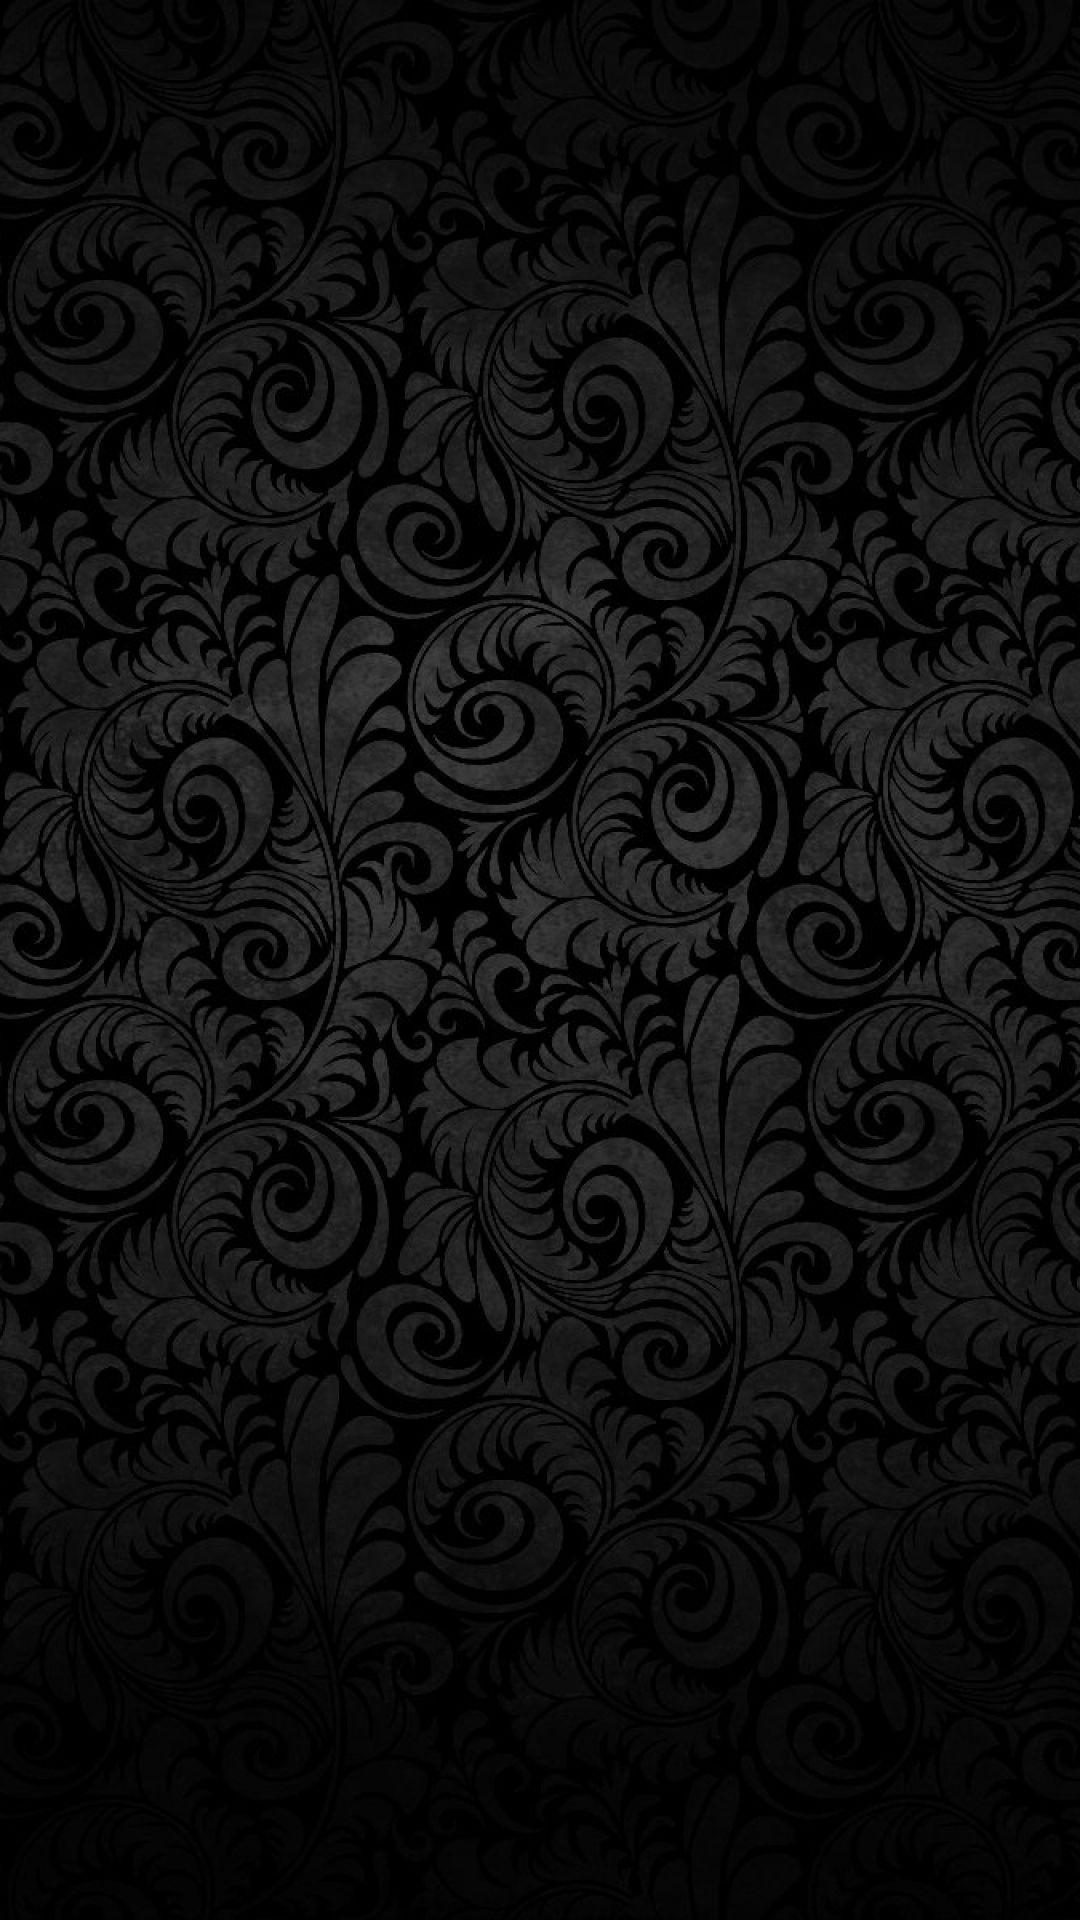 1080x1920 Black